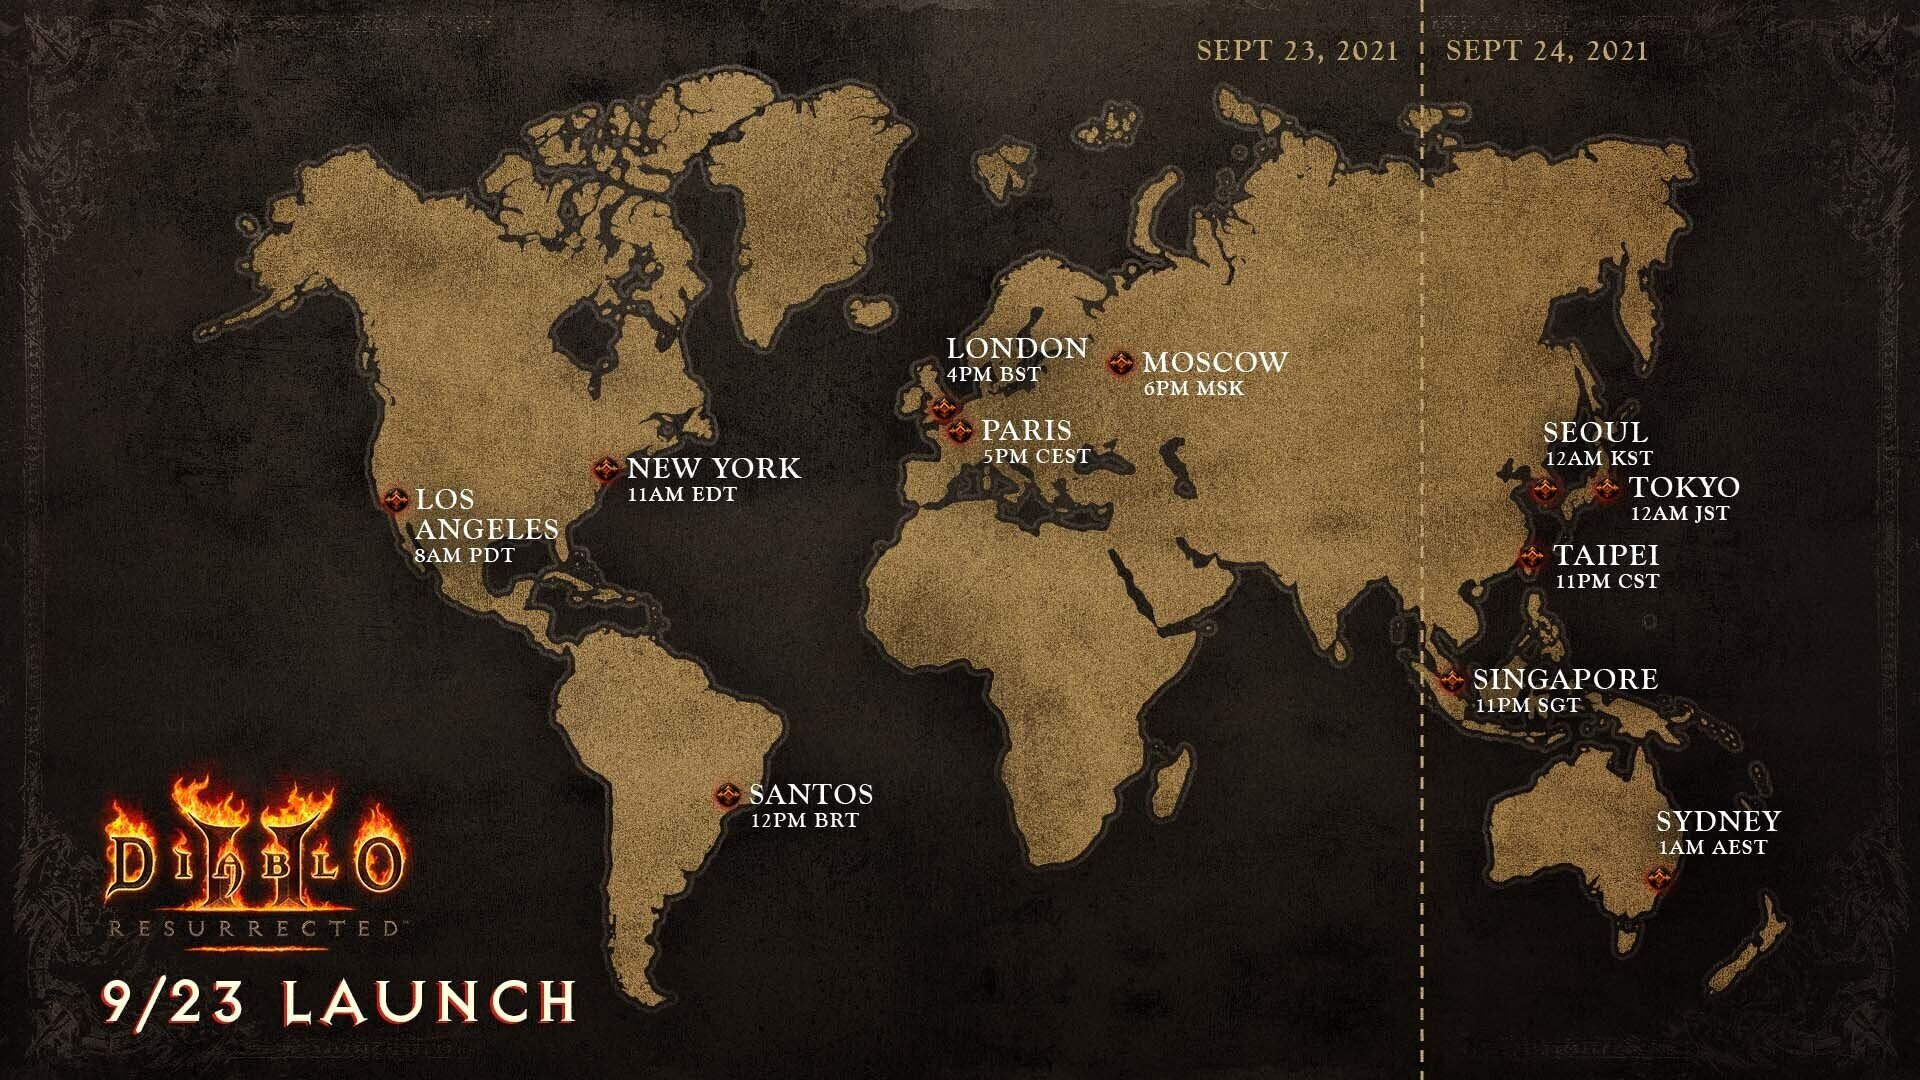 Diablo II: Resurrected - Launched